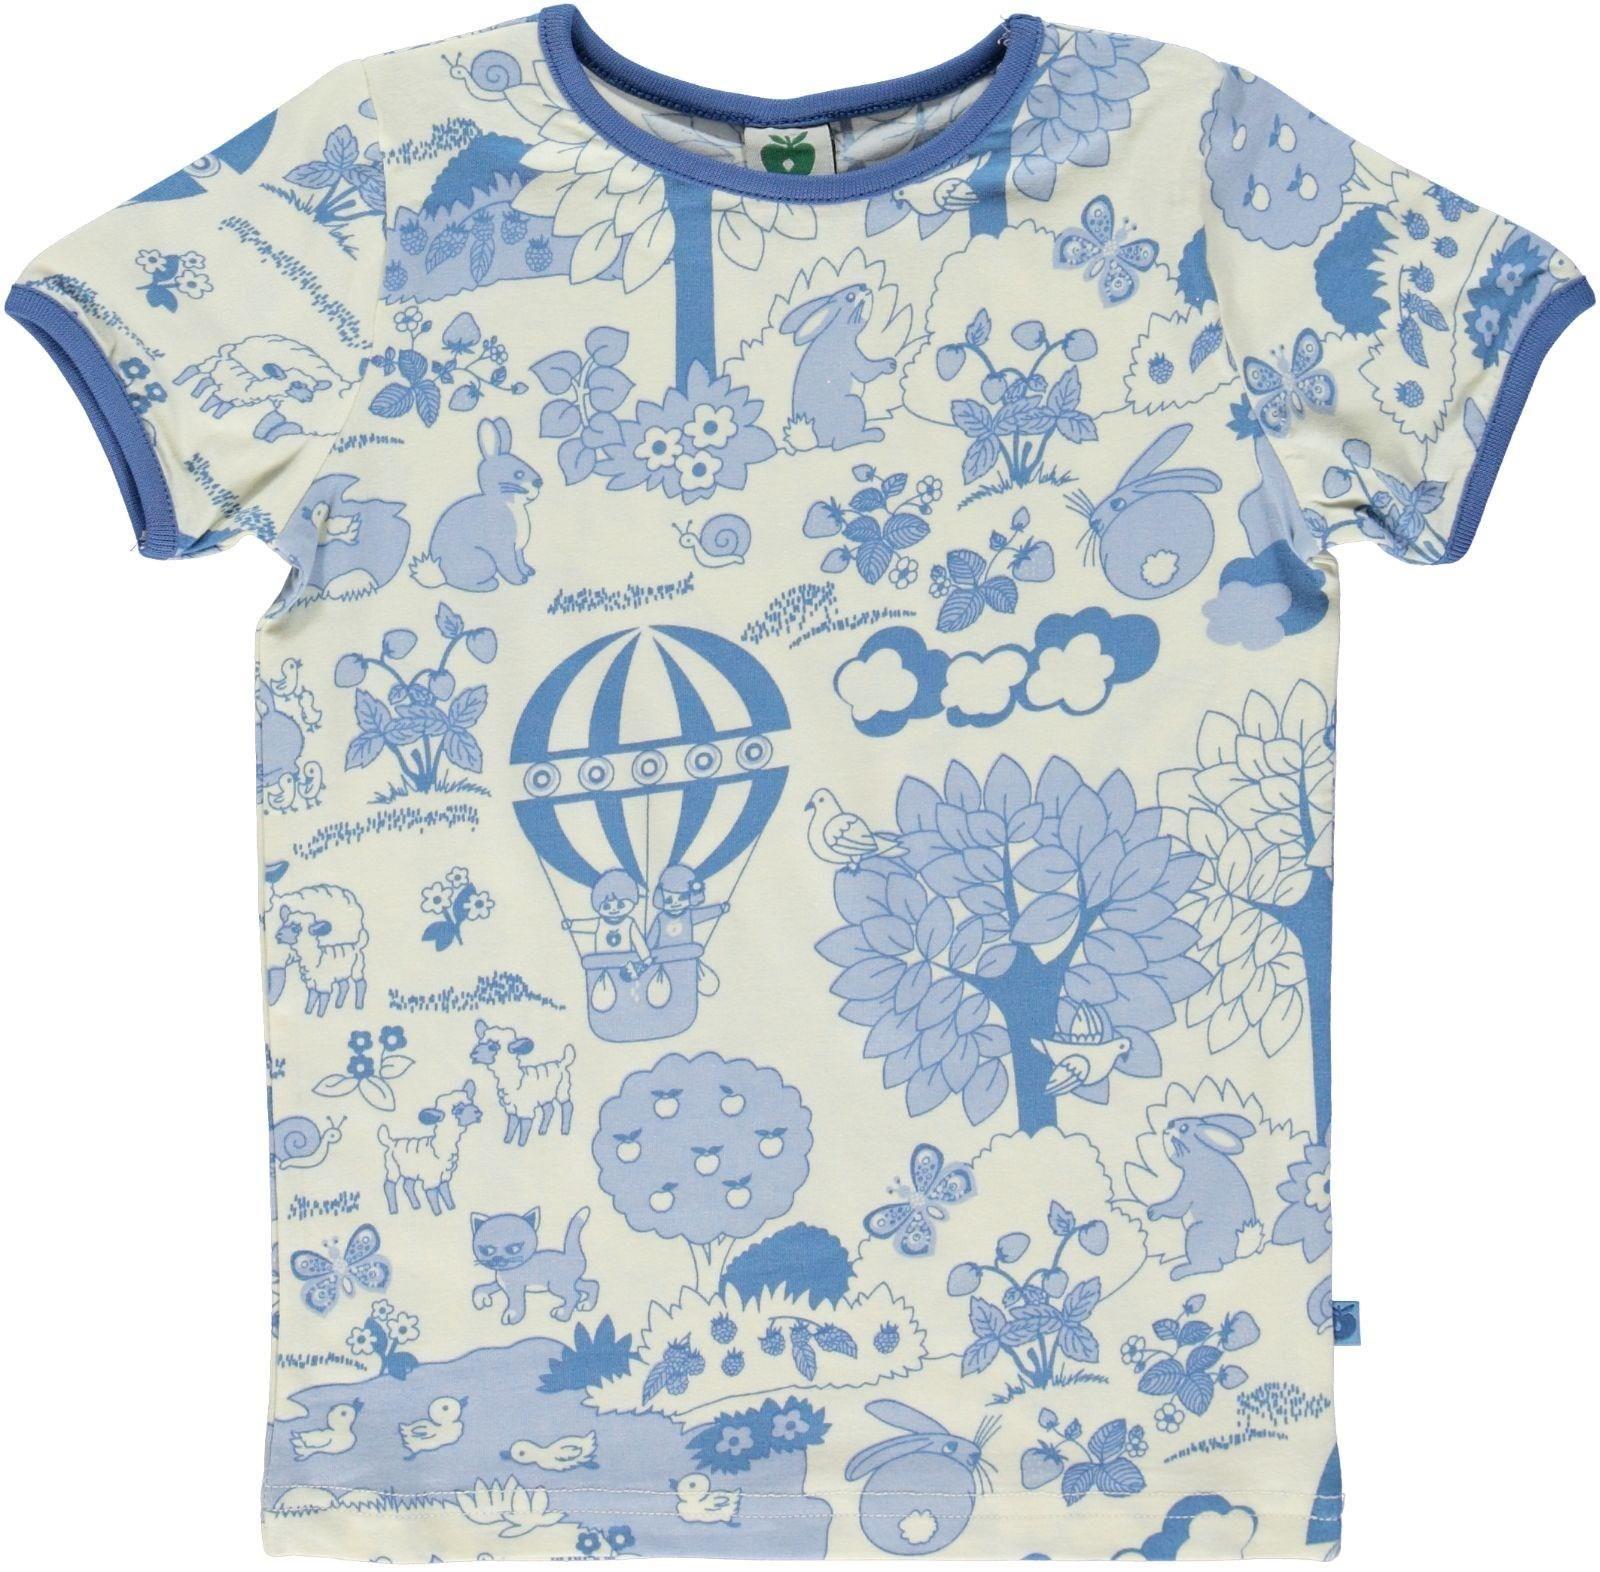 Smafolk s s tee Blue Landscape Retro Baby Clothes Baby Boy